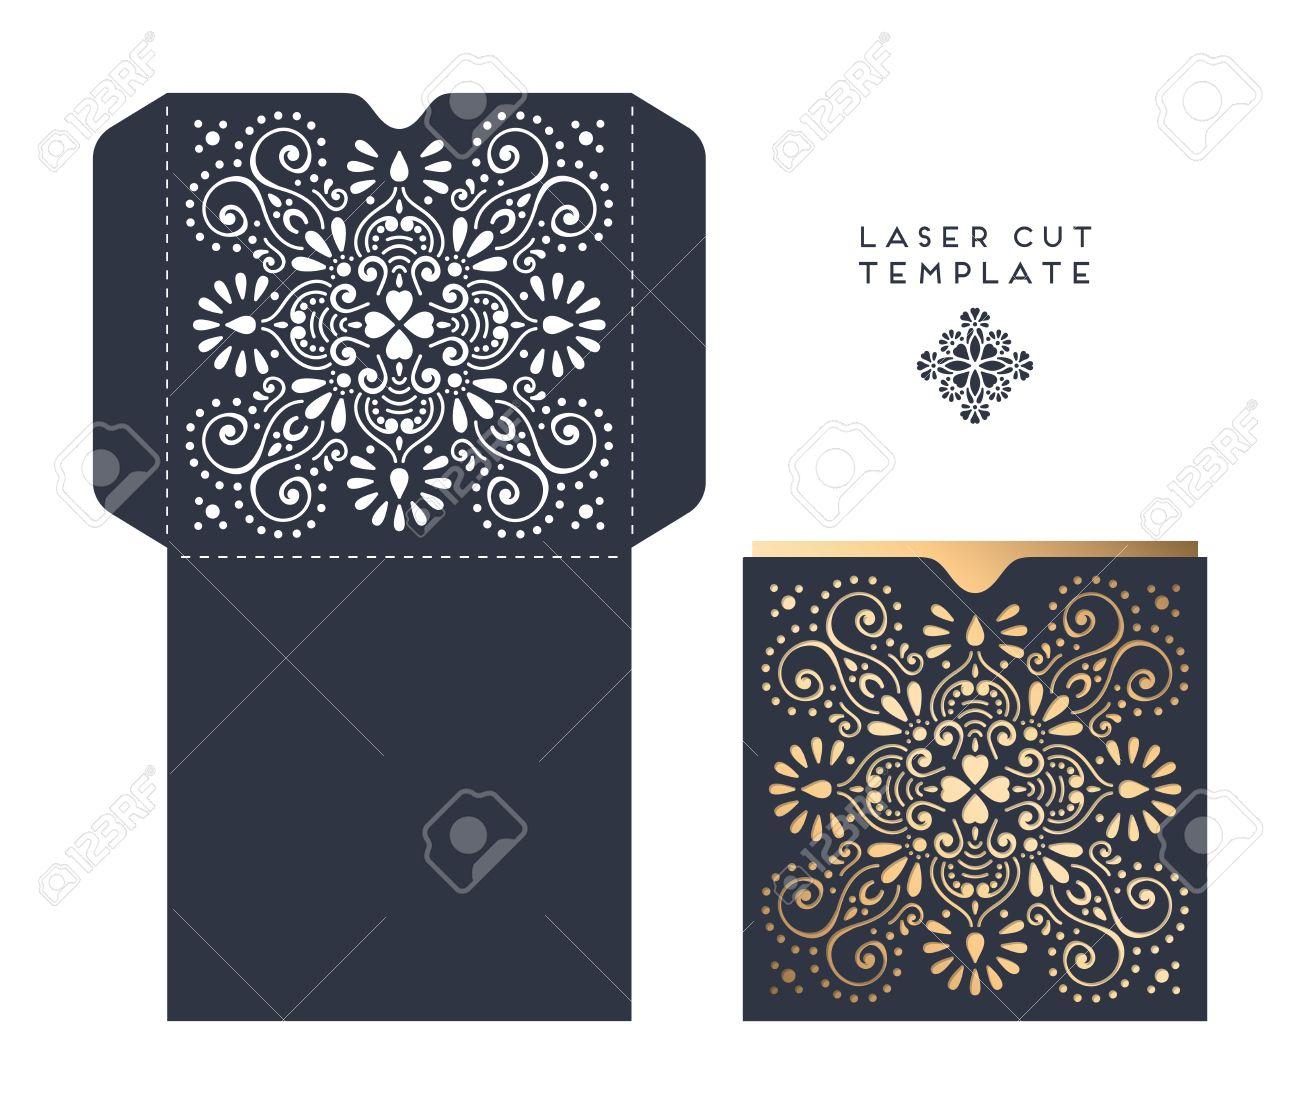 laser cut template envelope wedding card invitation royalty free